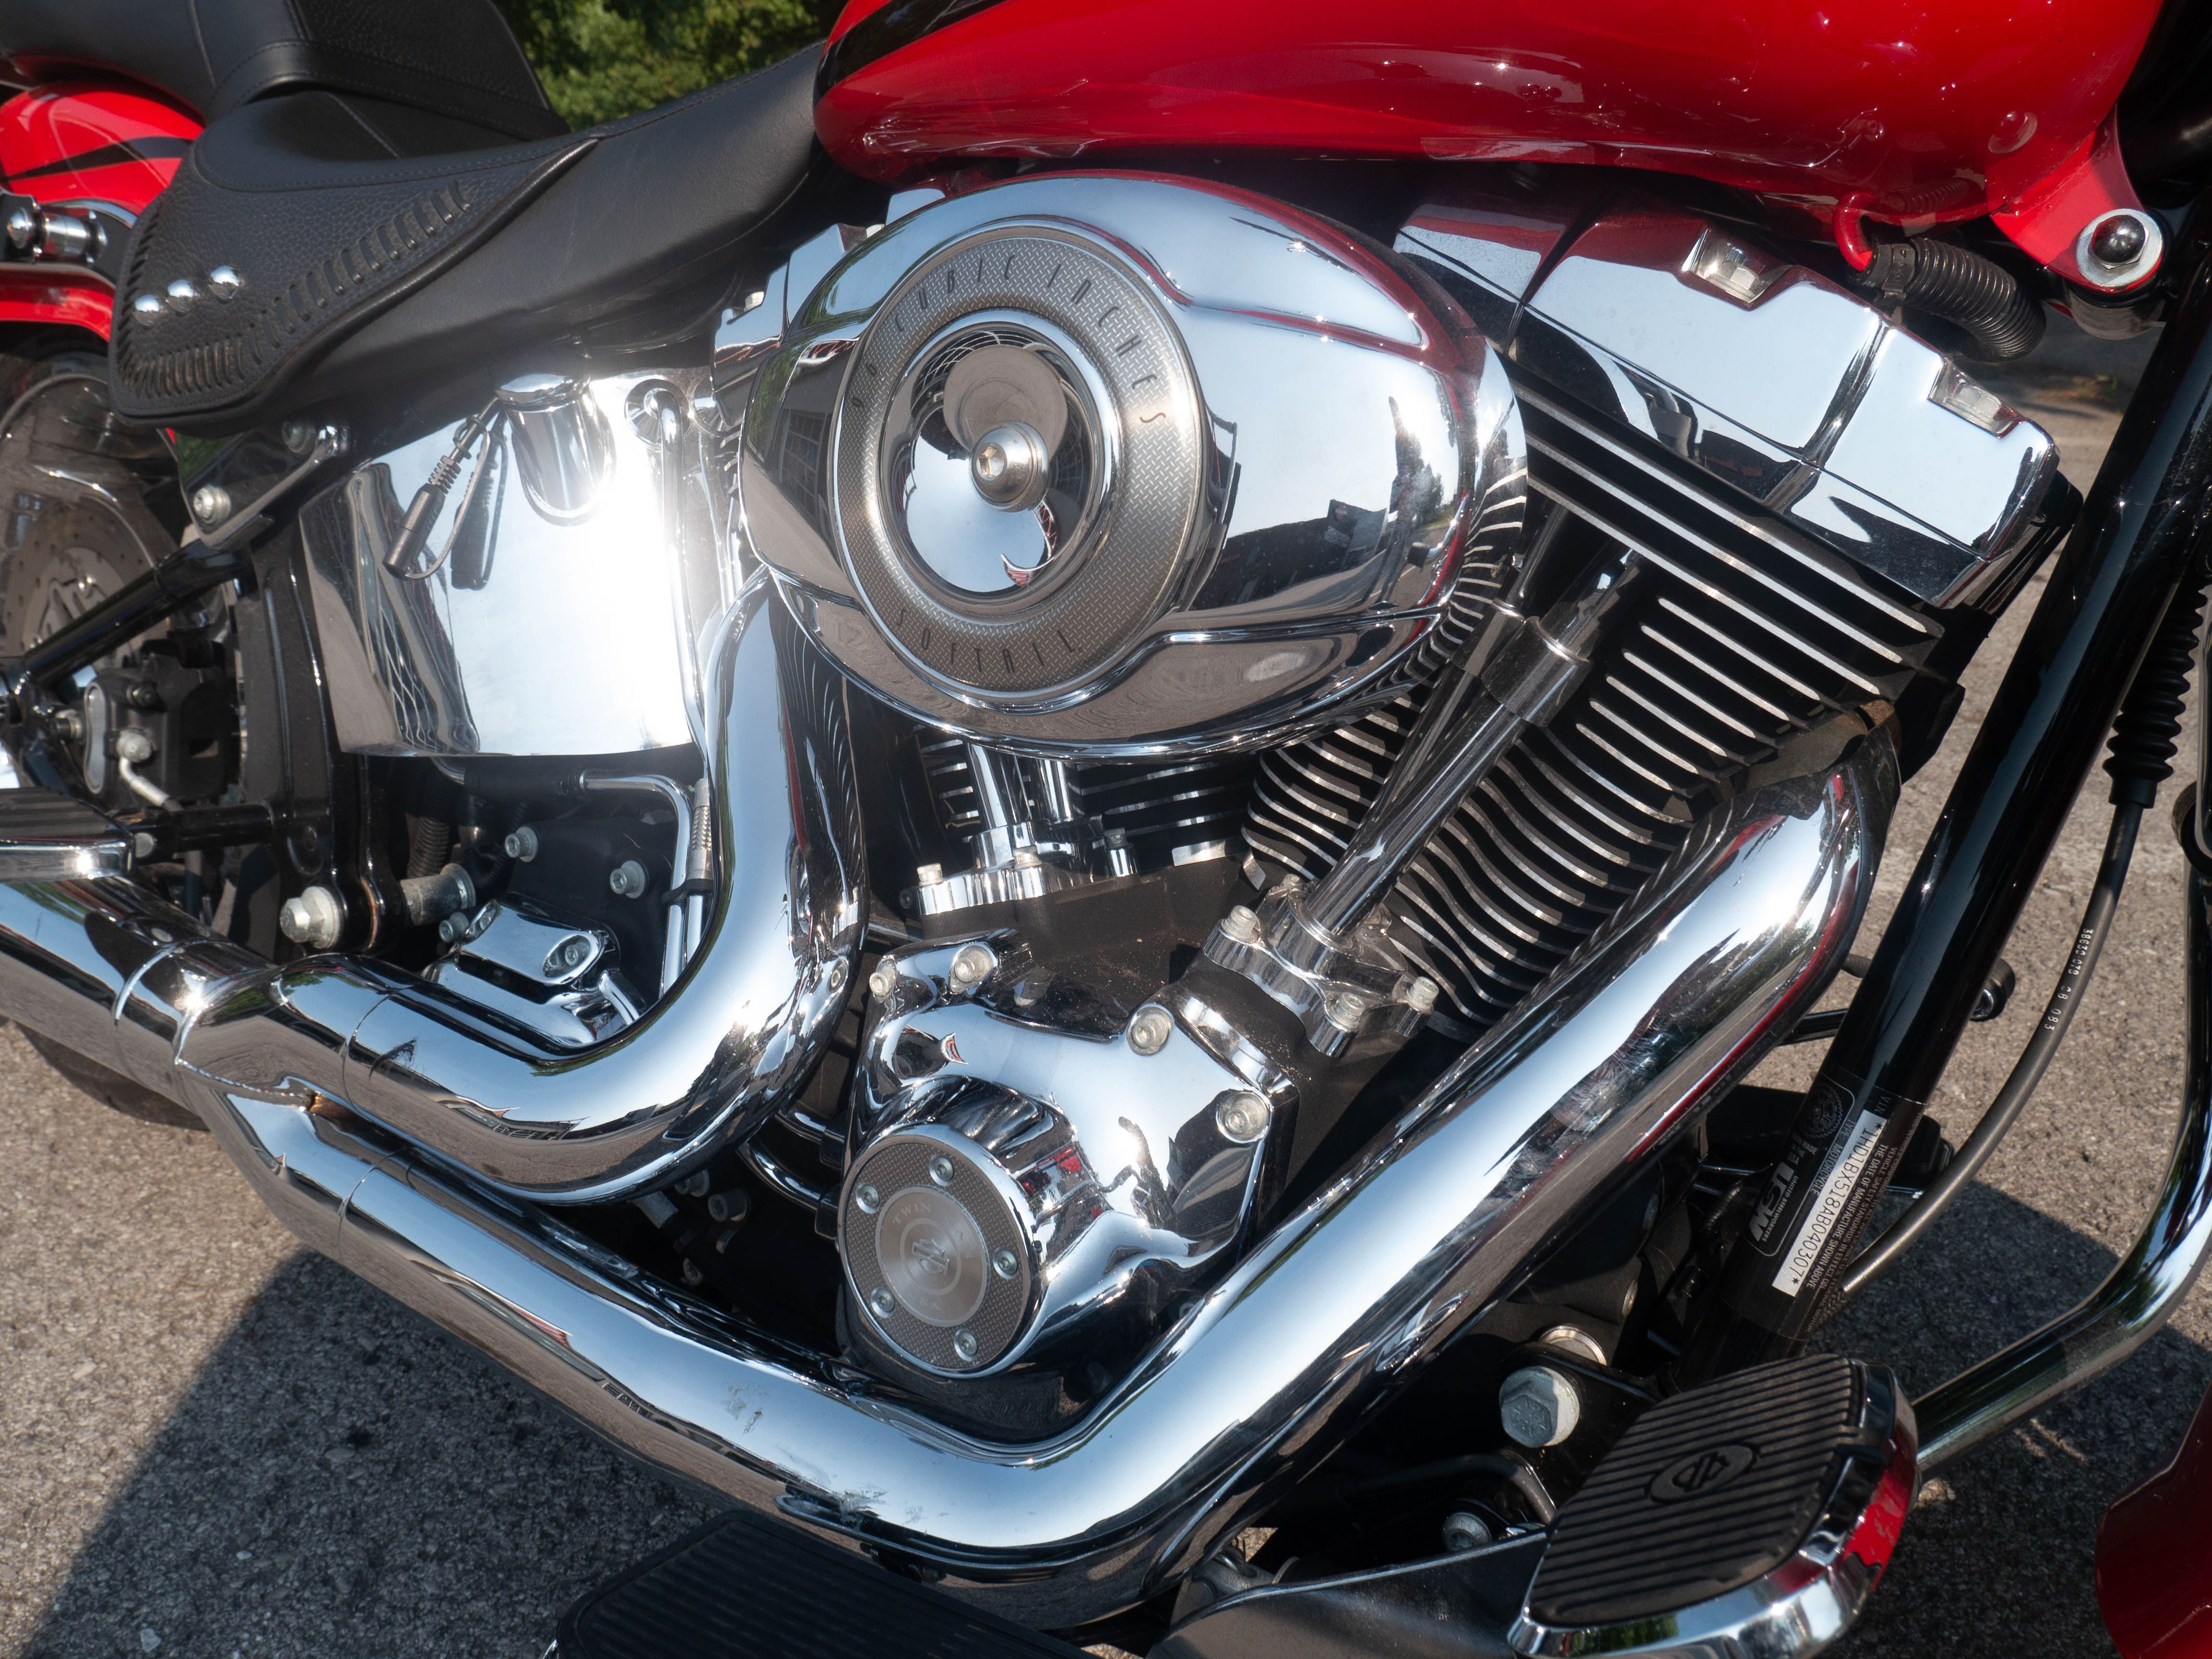 Pre-Owned 2010 Harley-Davidson Fat Boy